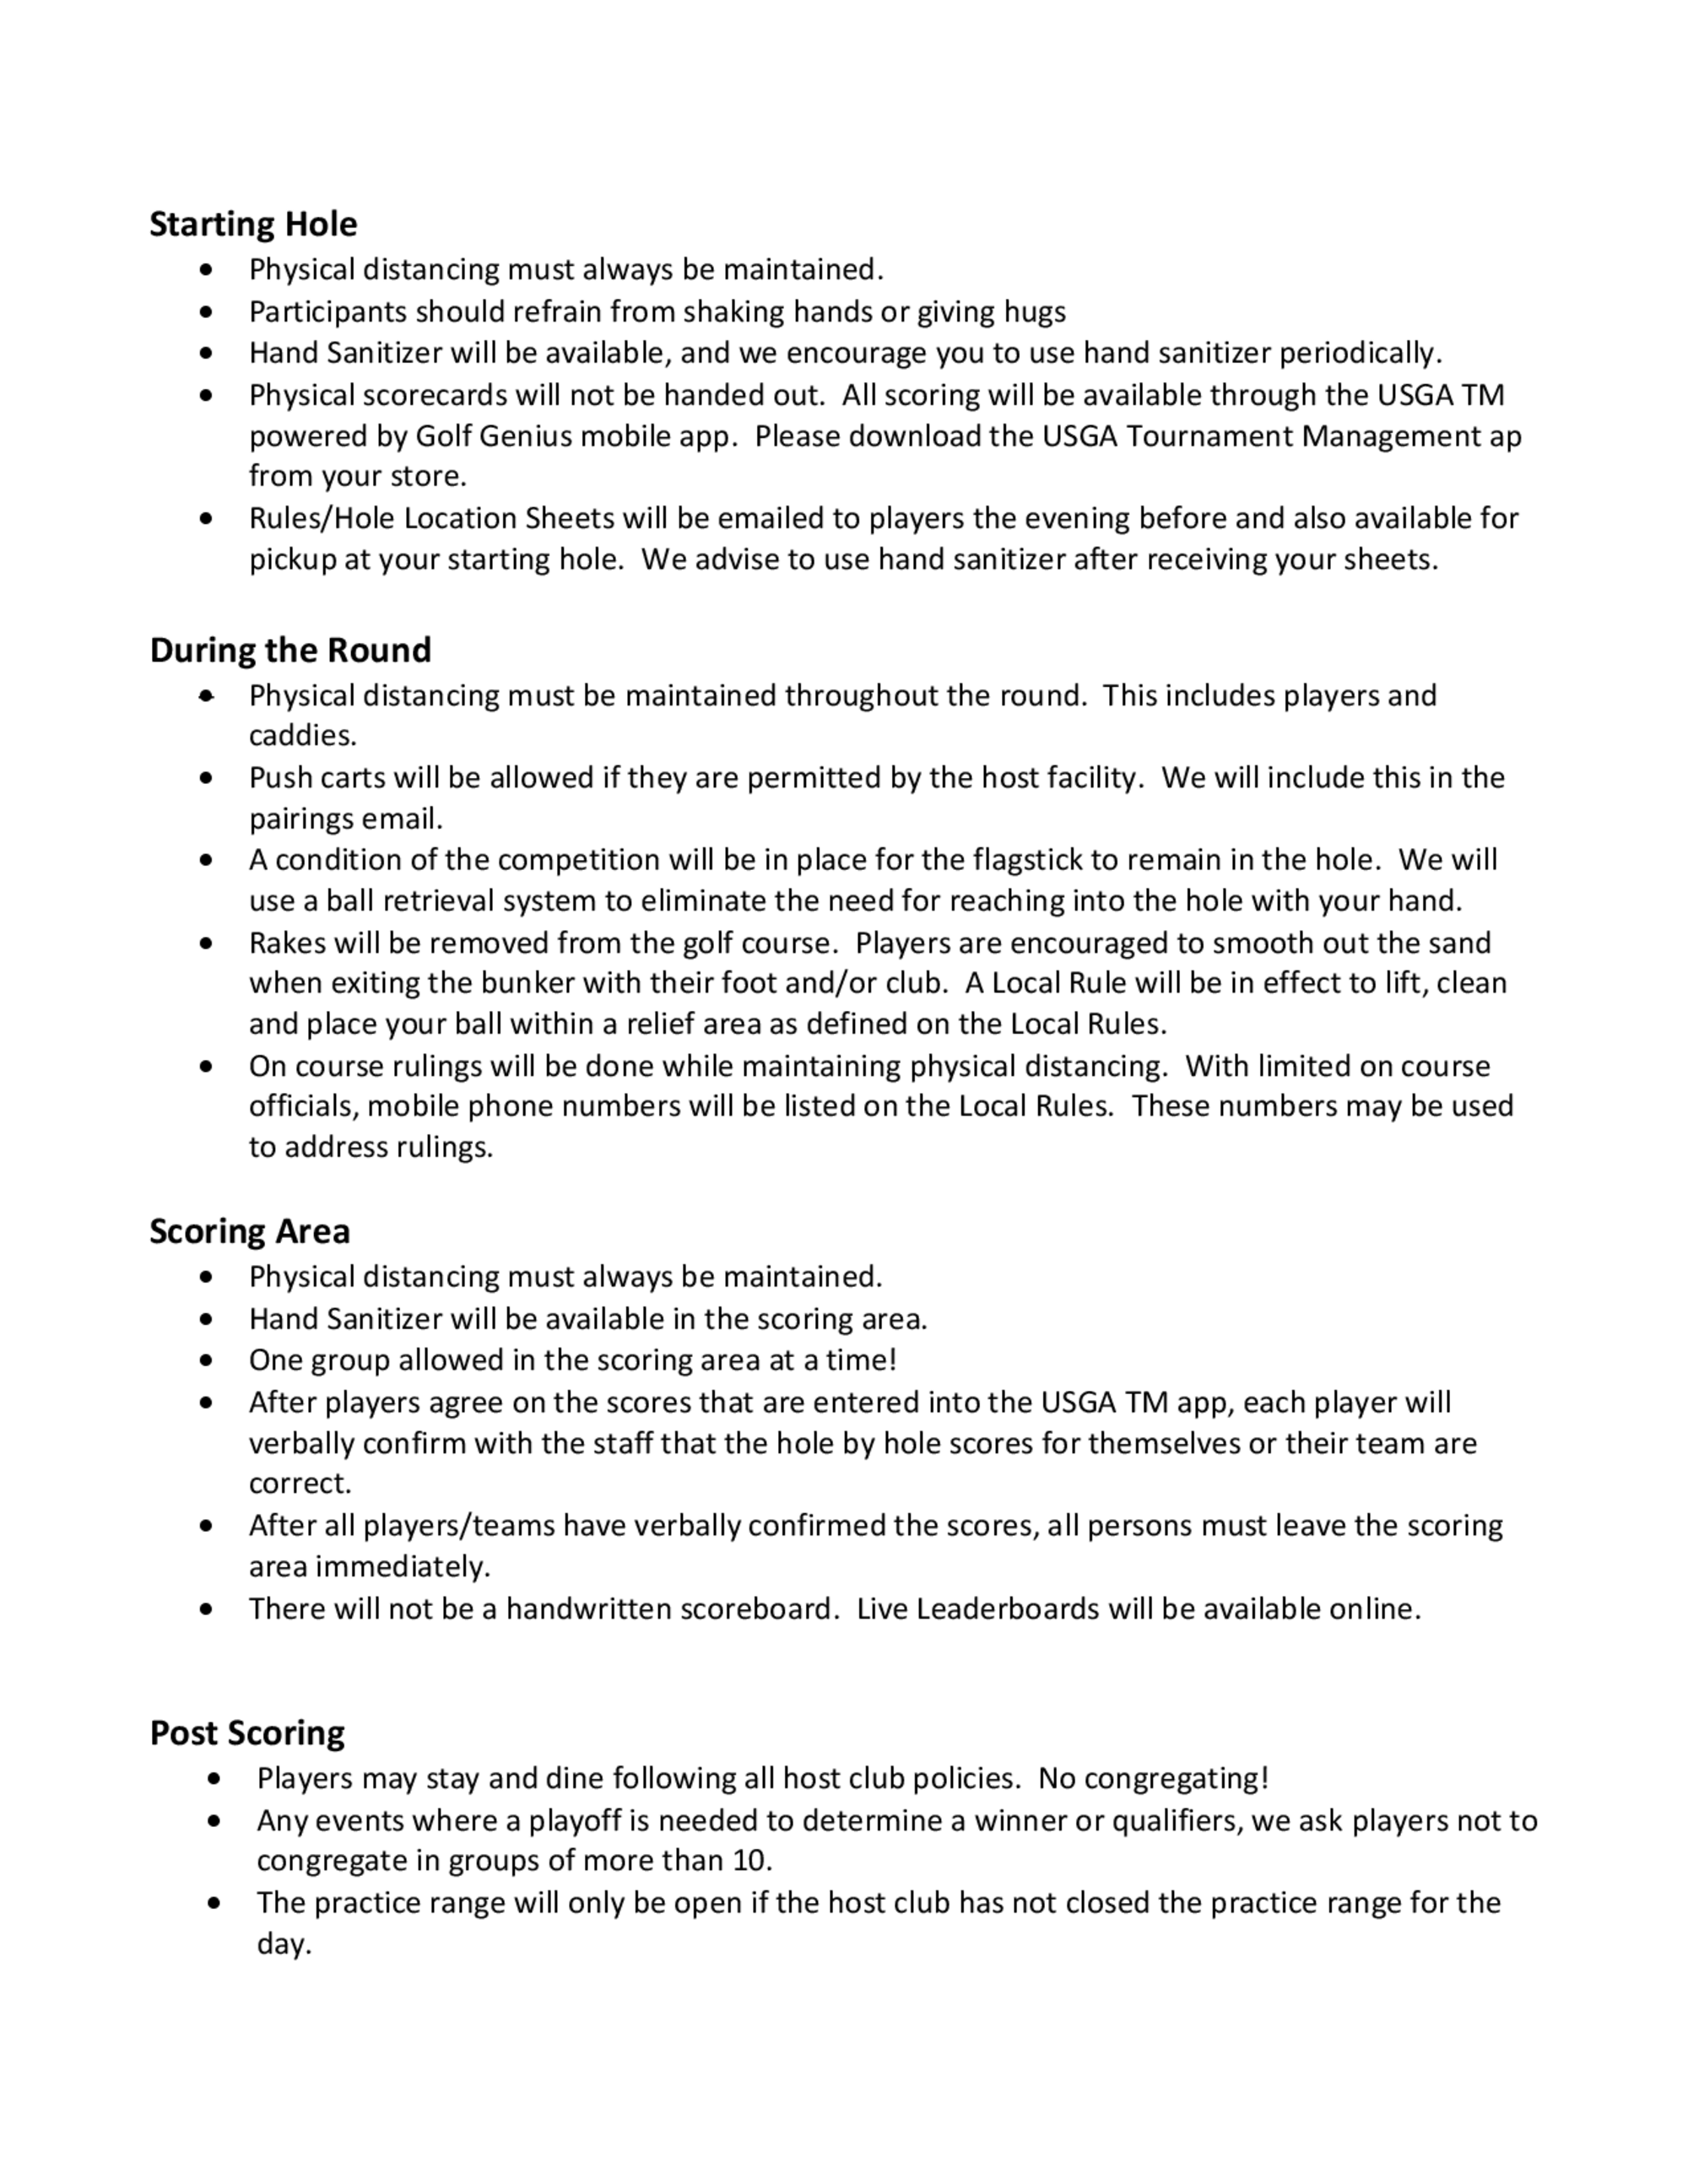 Covid 19 policies 2